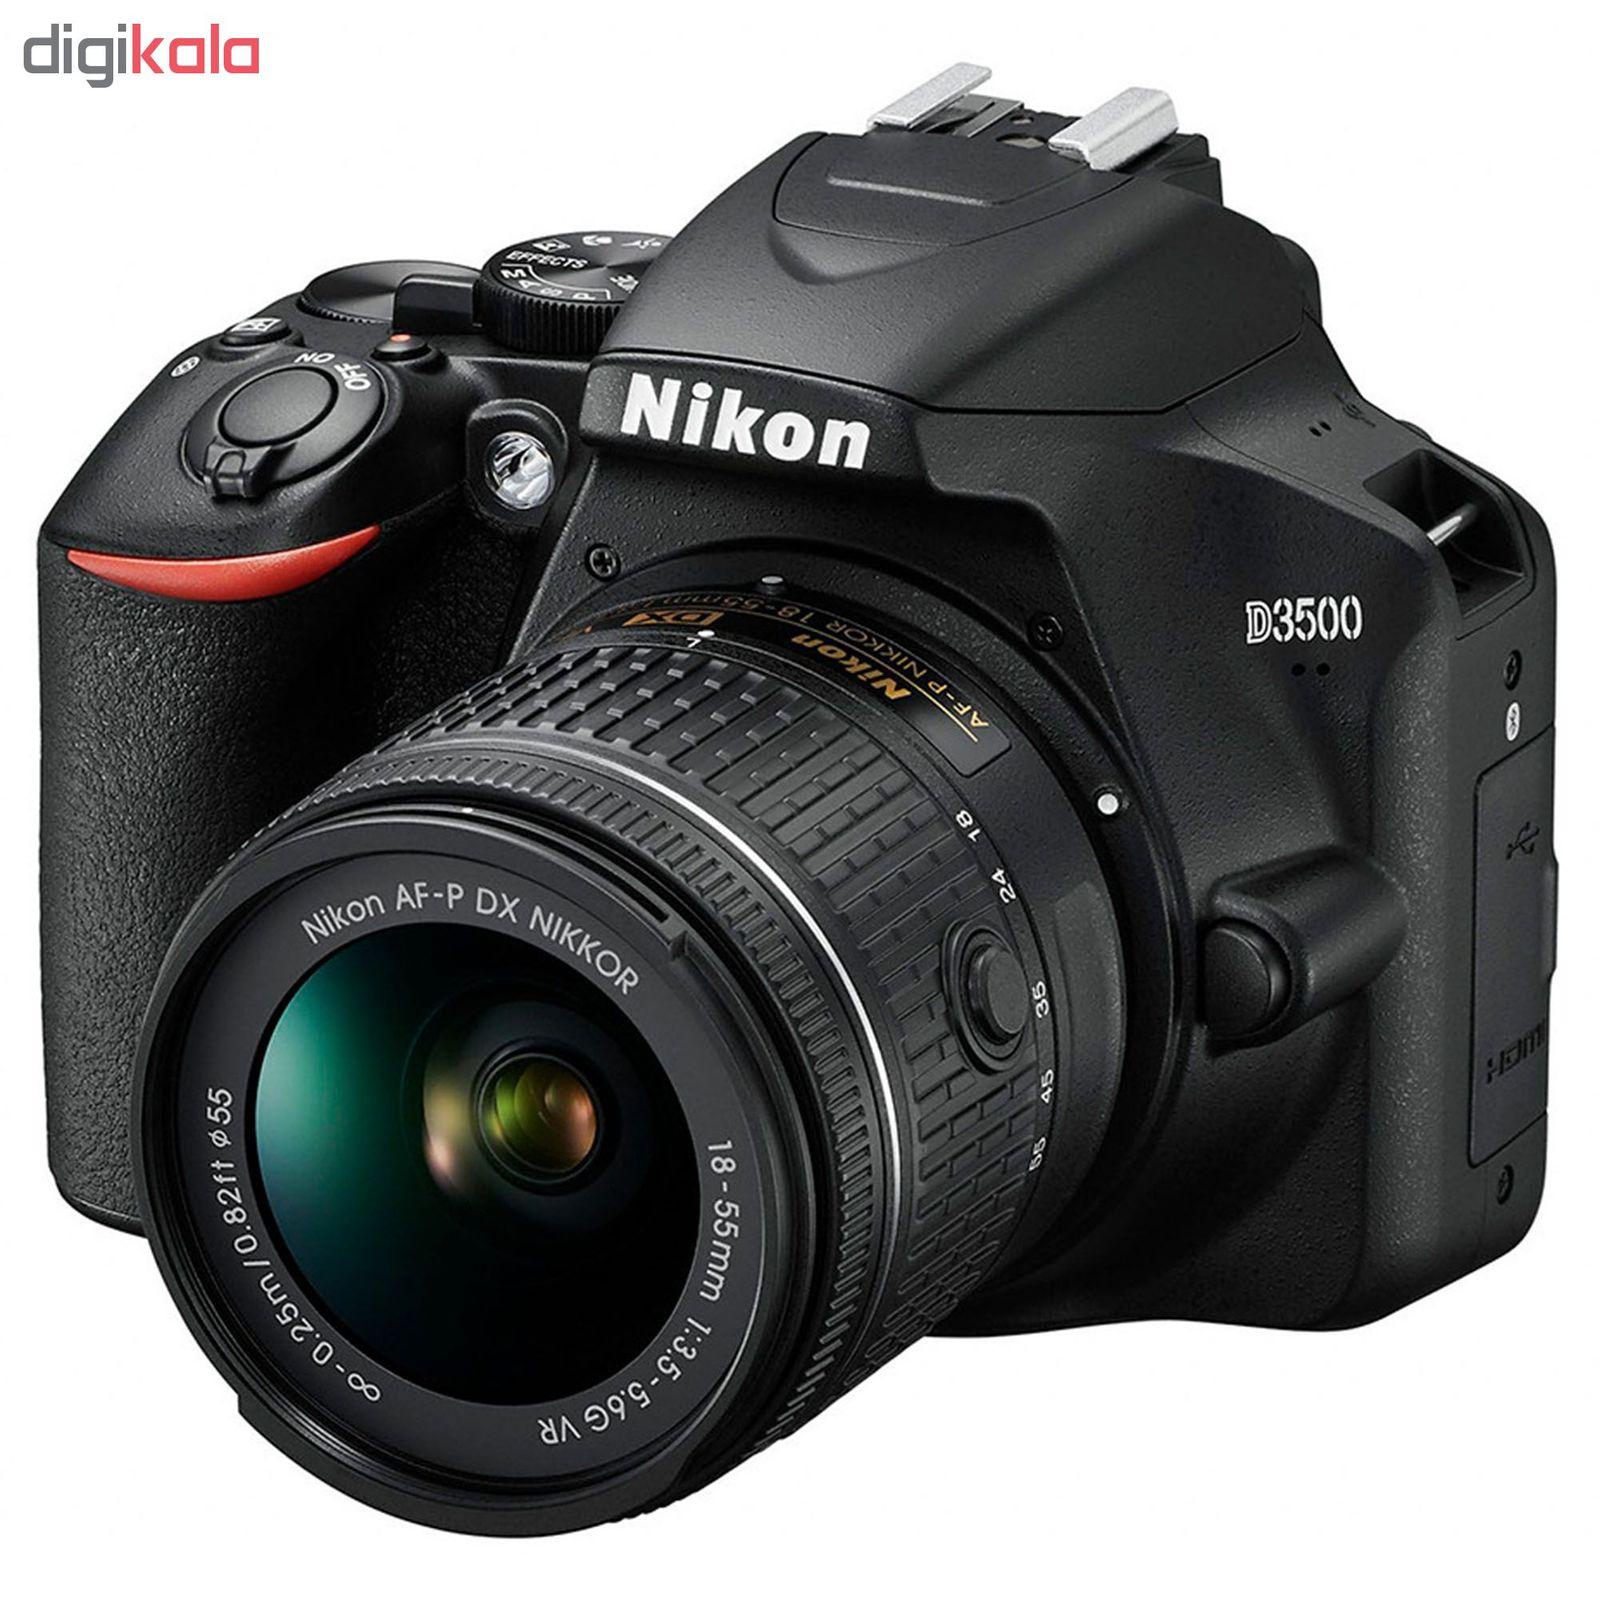 دوربین دیجیتال نیکون مدل D3500 به همراه لنز 18-55 میلی متر VR AF-P main 1 1